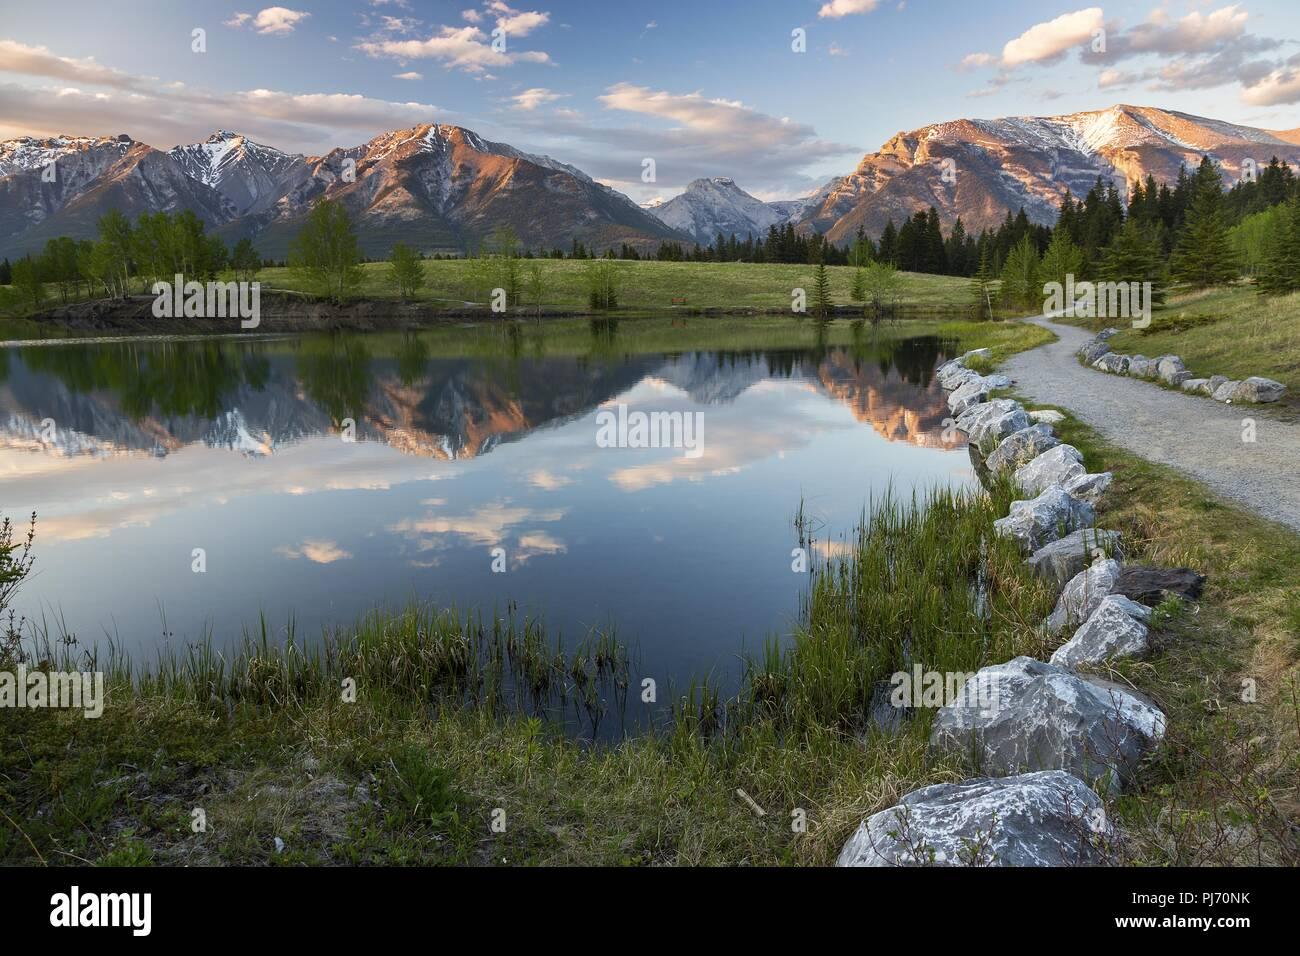 walking-path-and-quarry-lake-landscape-w